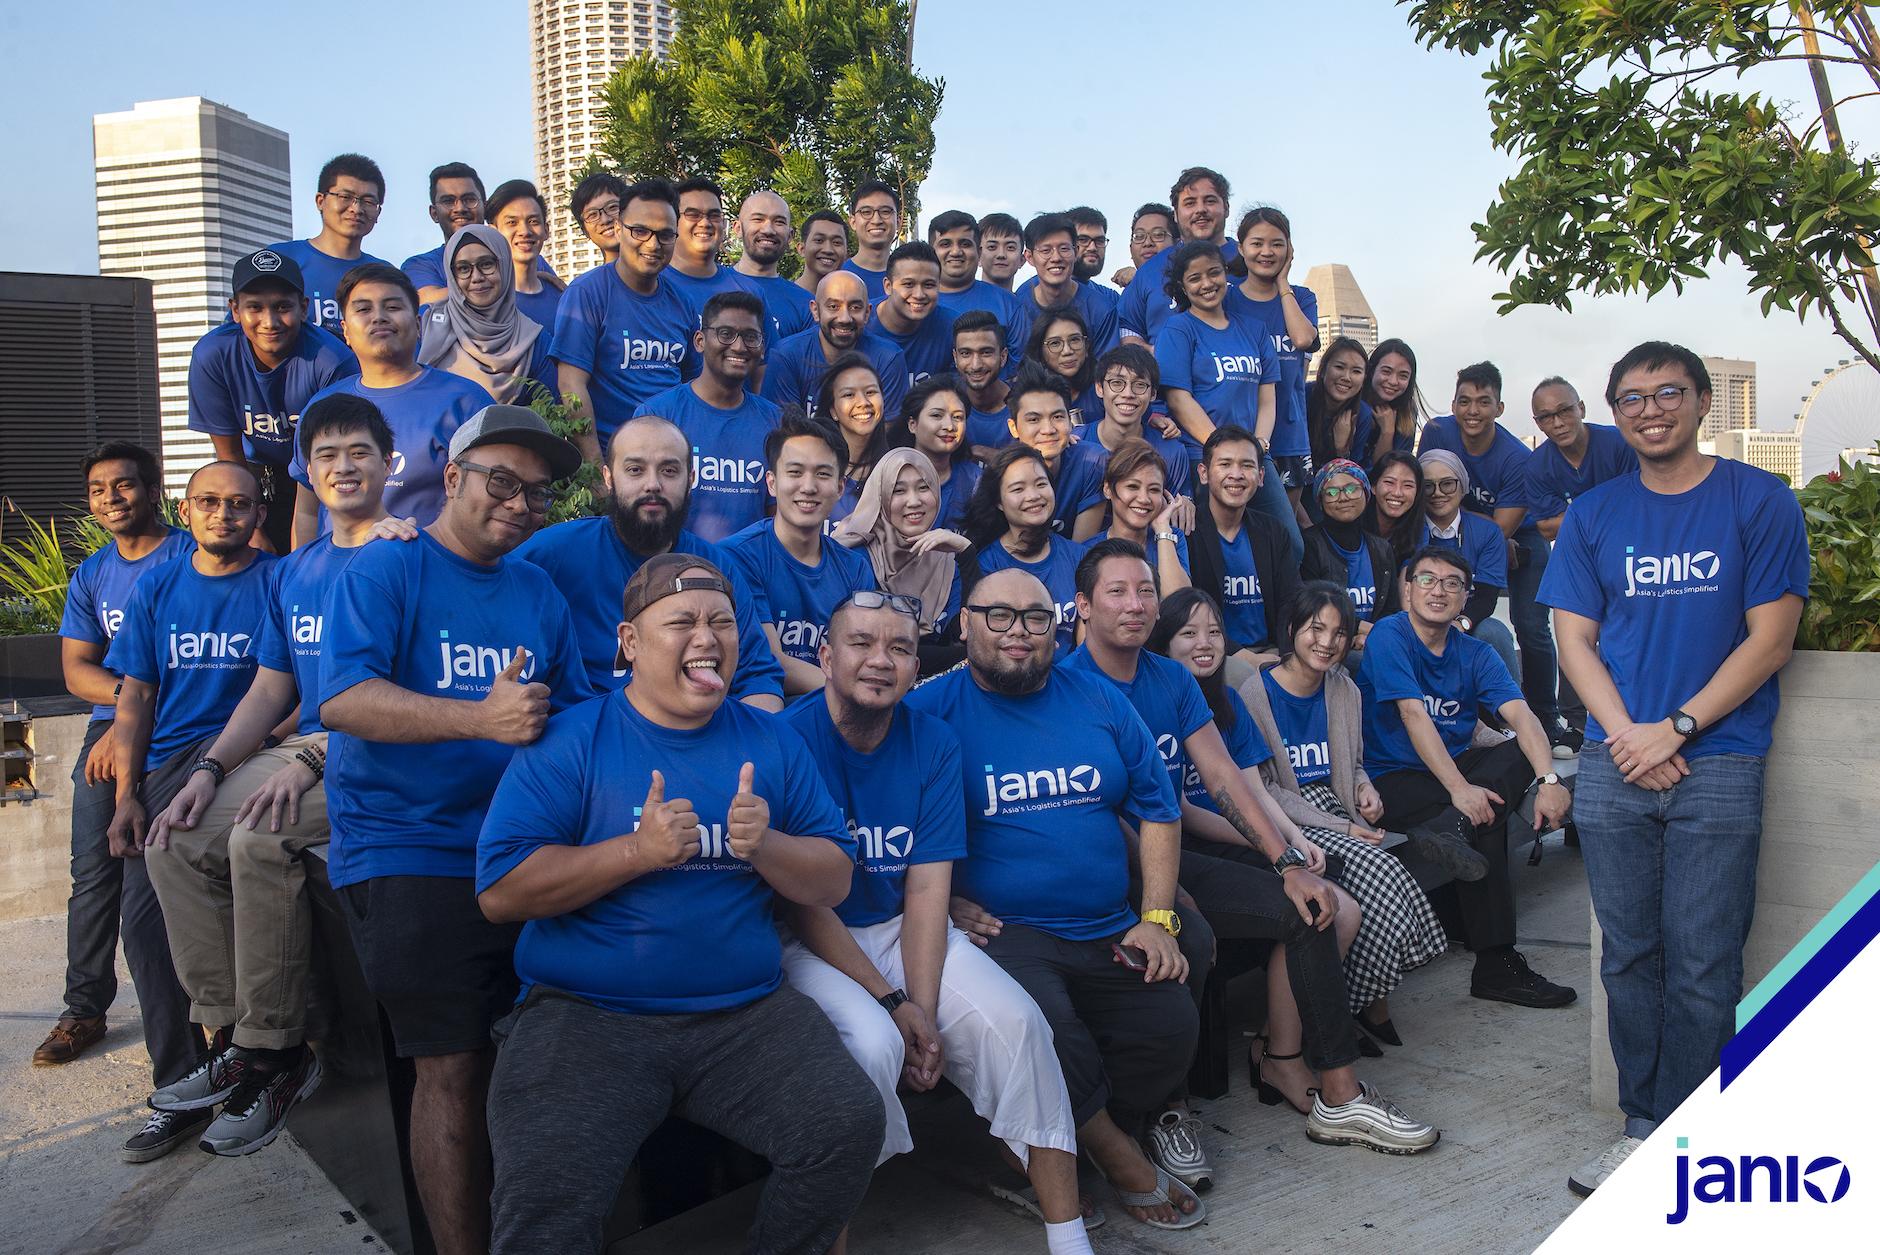 a company group photo